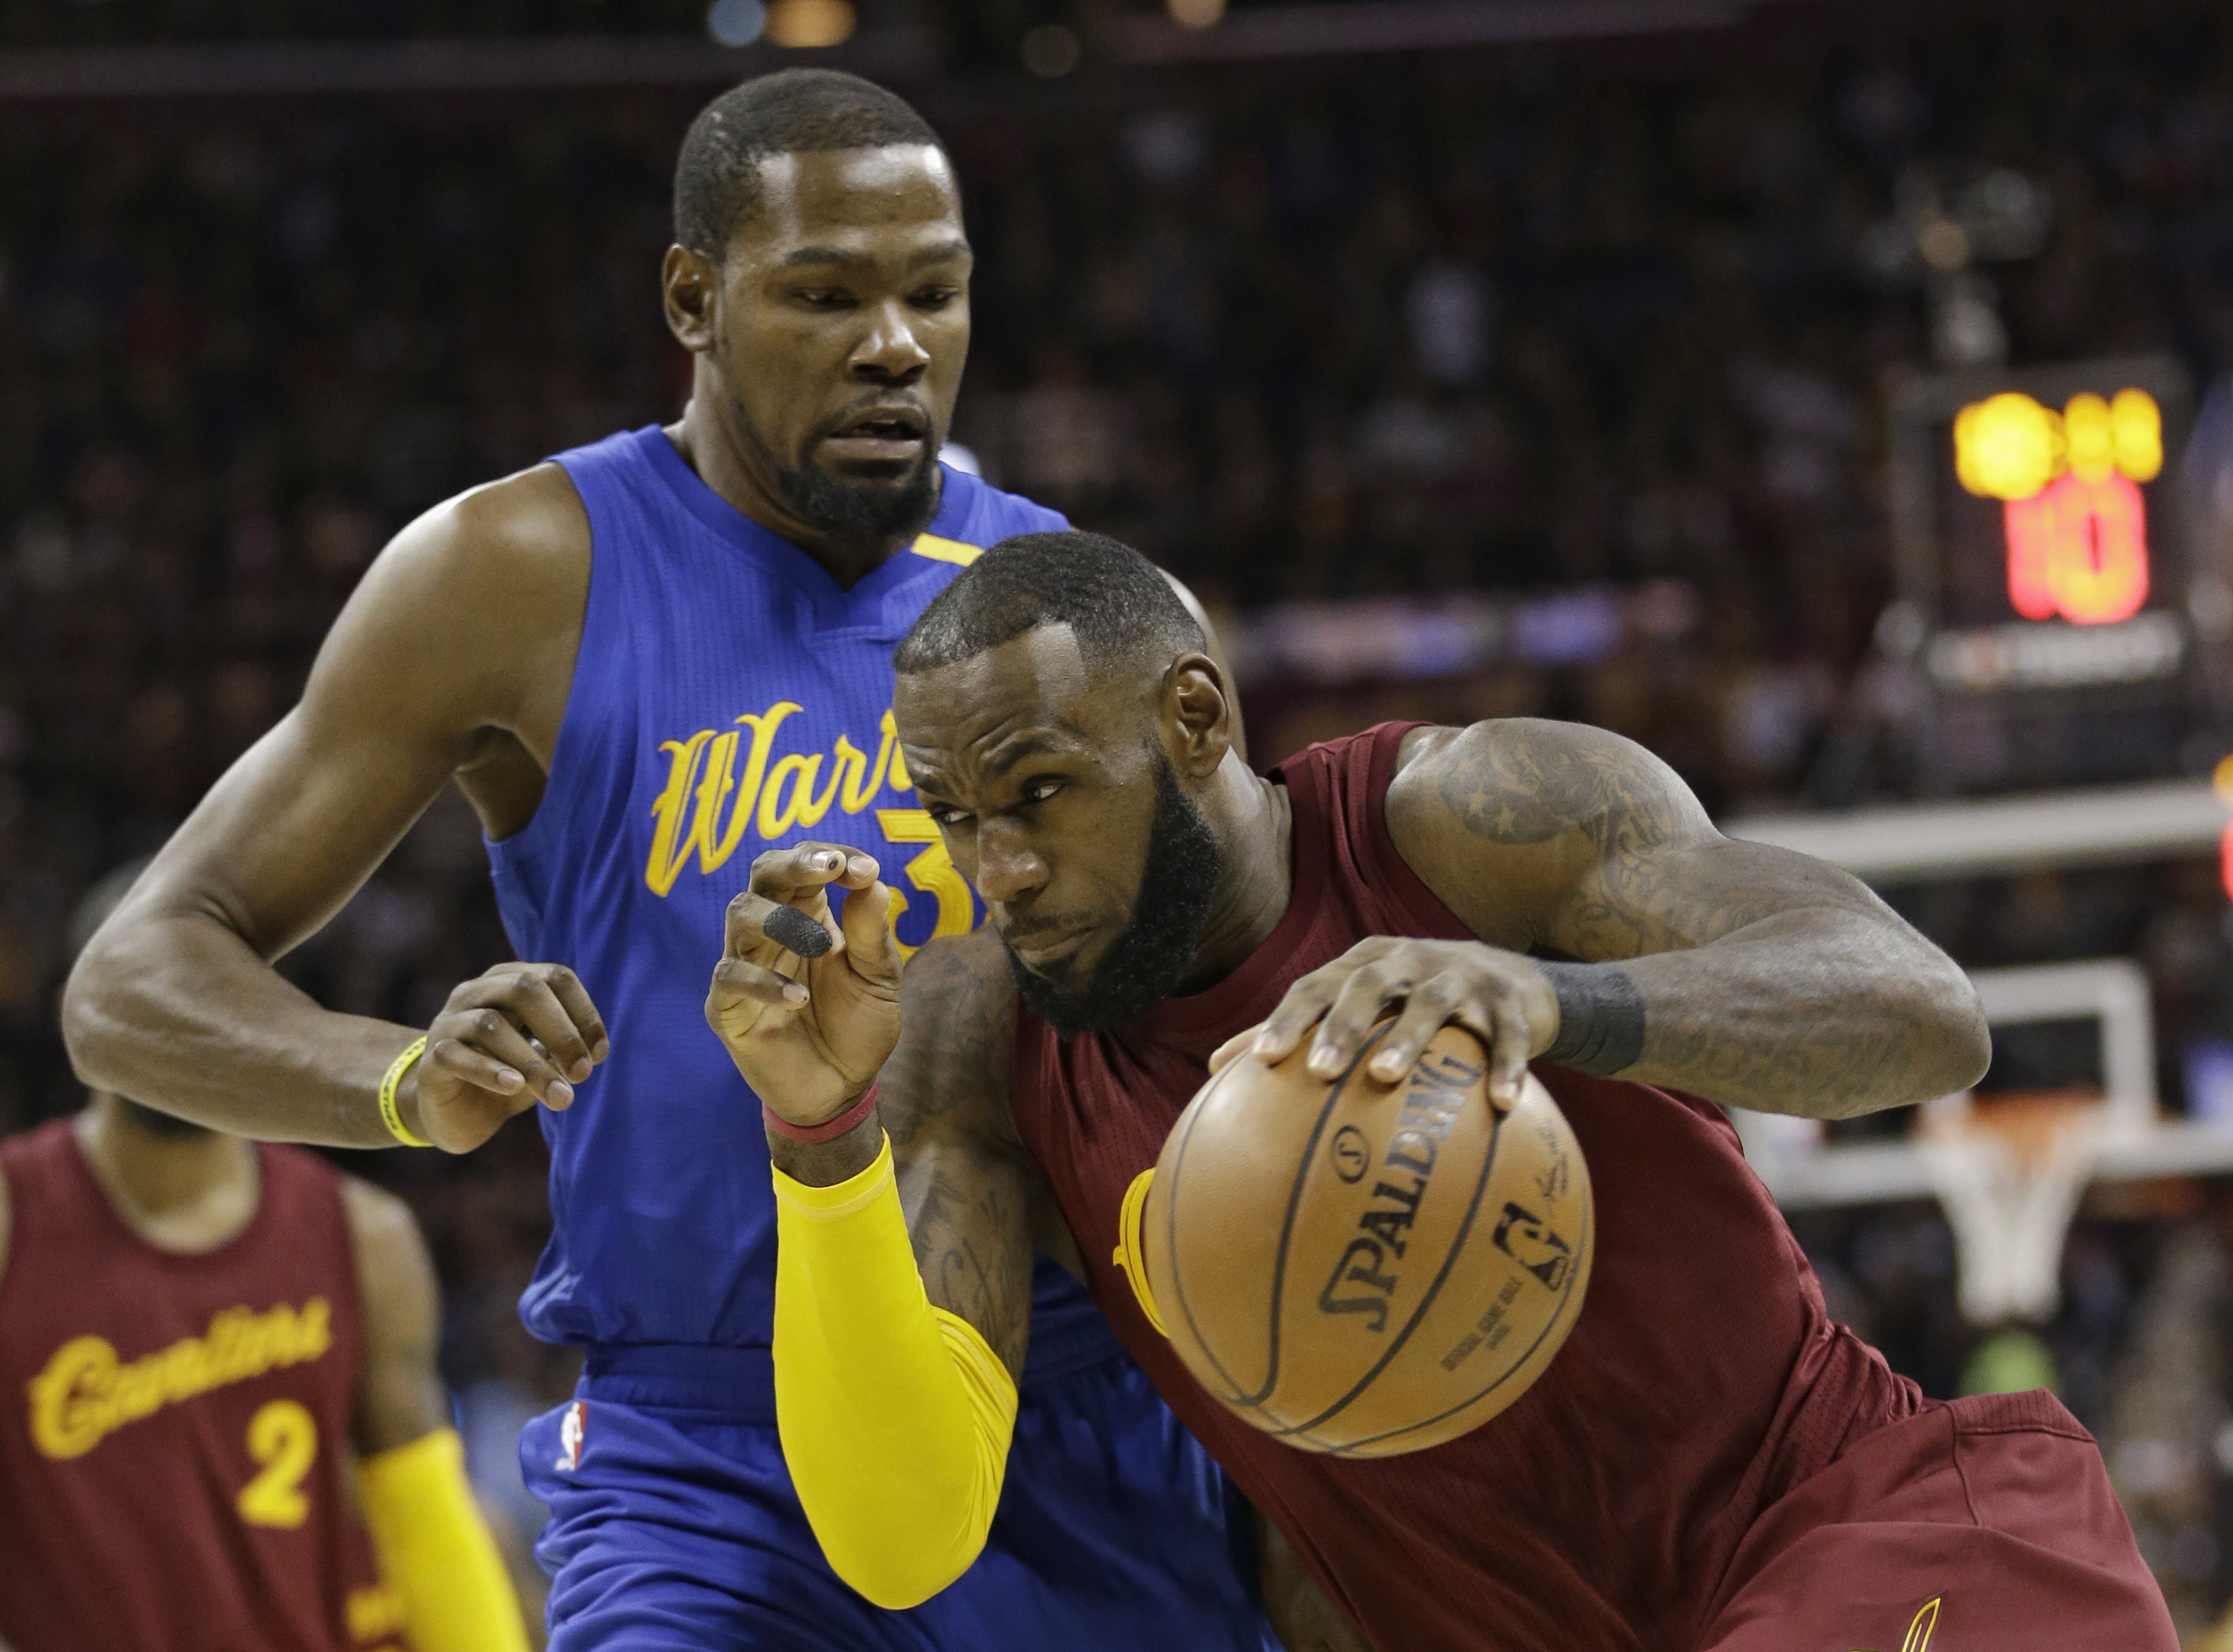 Плейофите в НБА: Кой срещу кого се изправя